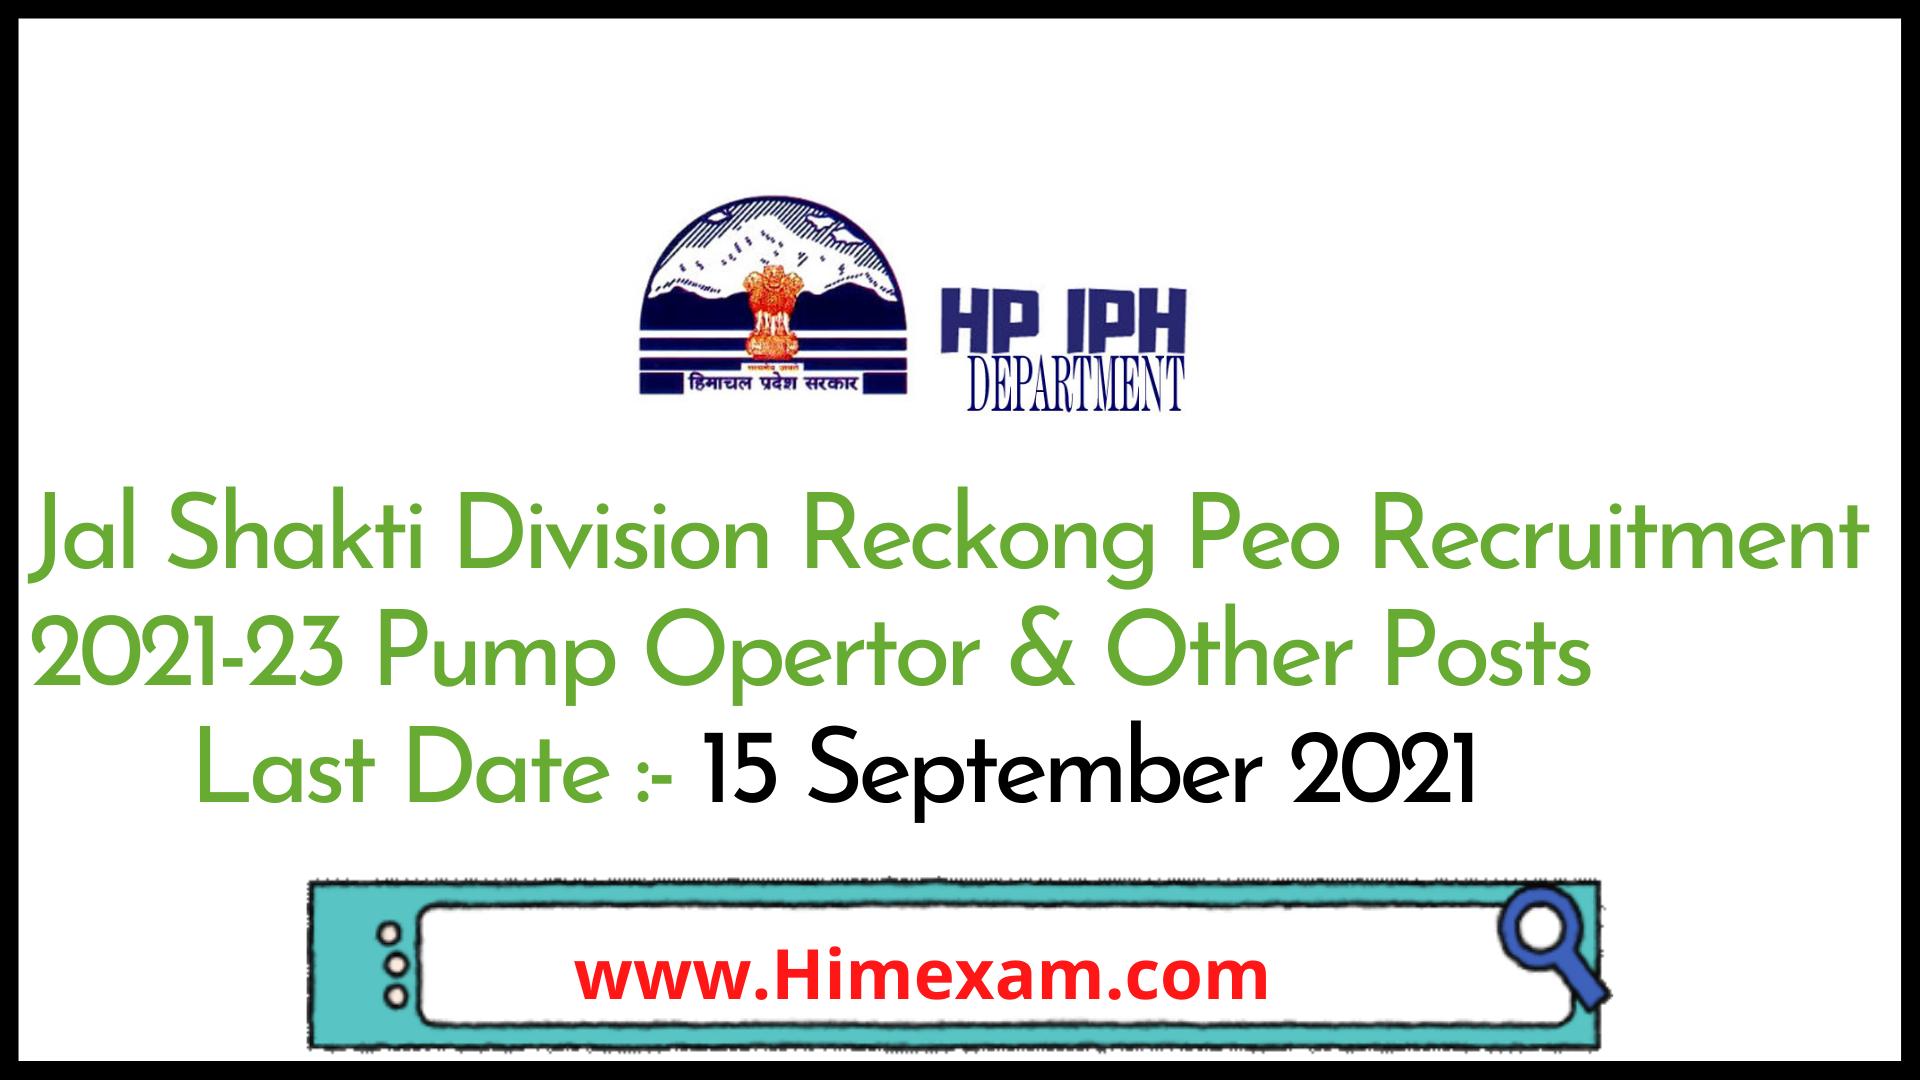 Jal Shakti Division Reckong Peo Recruitment 2021-23 Pump Opertor & Other Posts